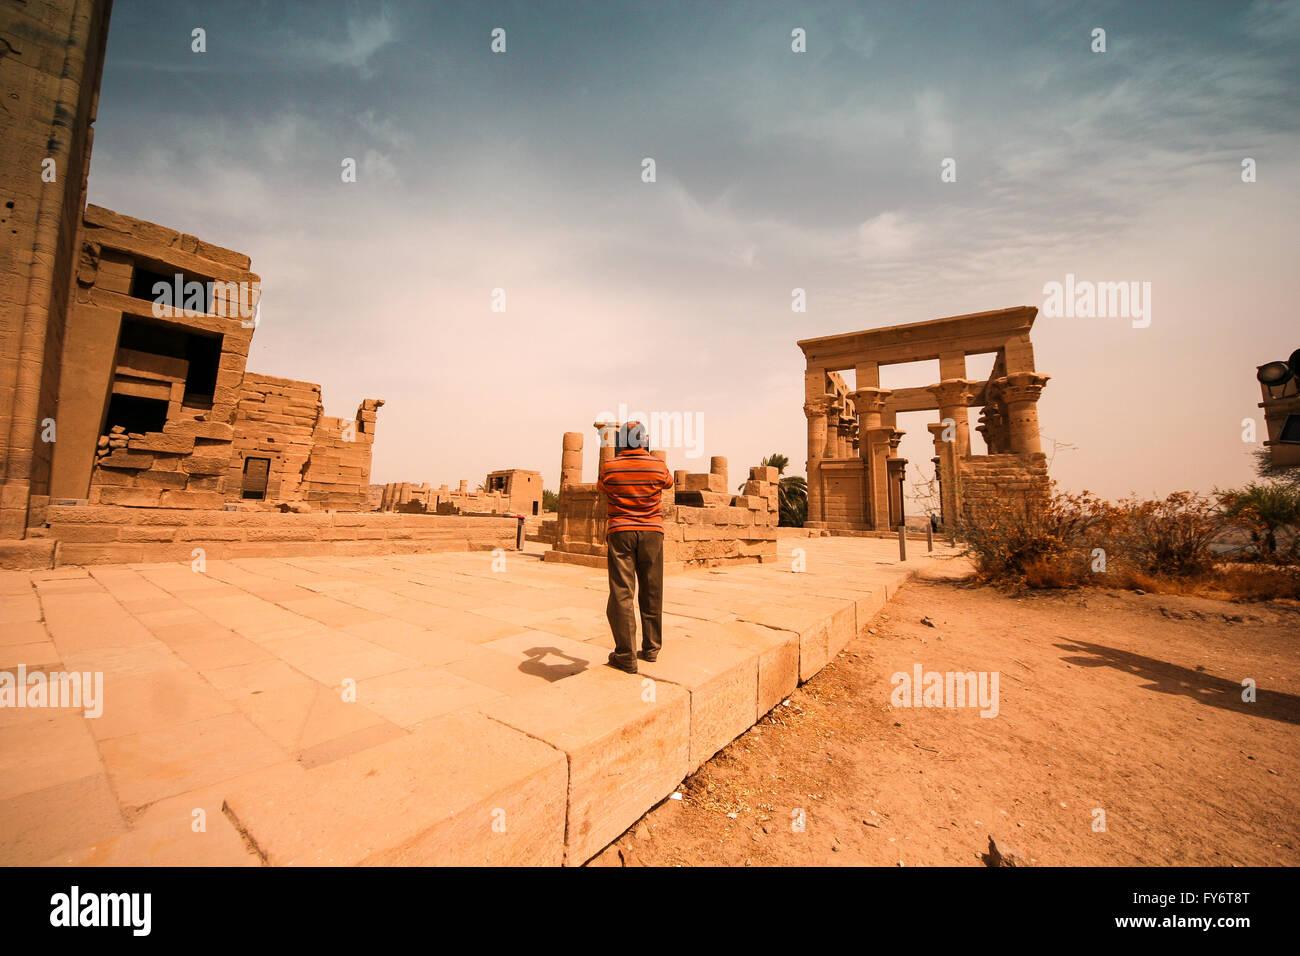 Tempel von Philae, UNESCO-Weltkulturerbe, Insel Agilkia, Nile Valley, Nubien, Ägypten, Nordafrika Stockbild